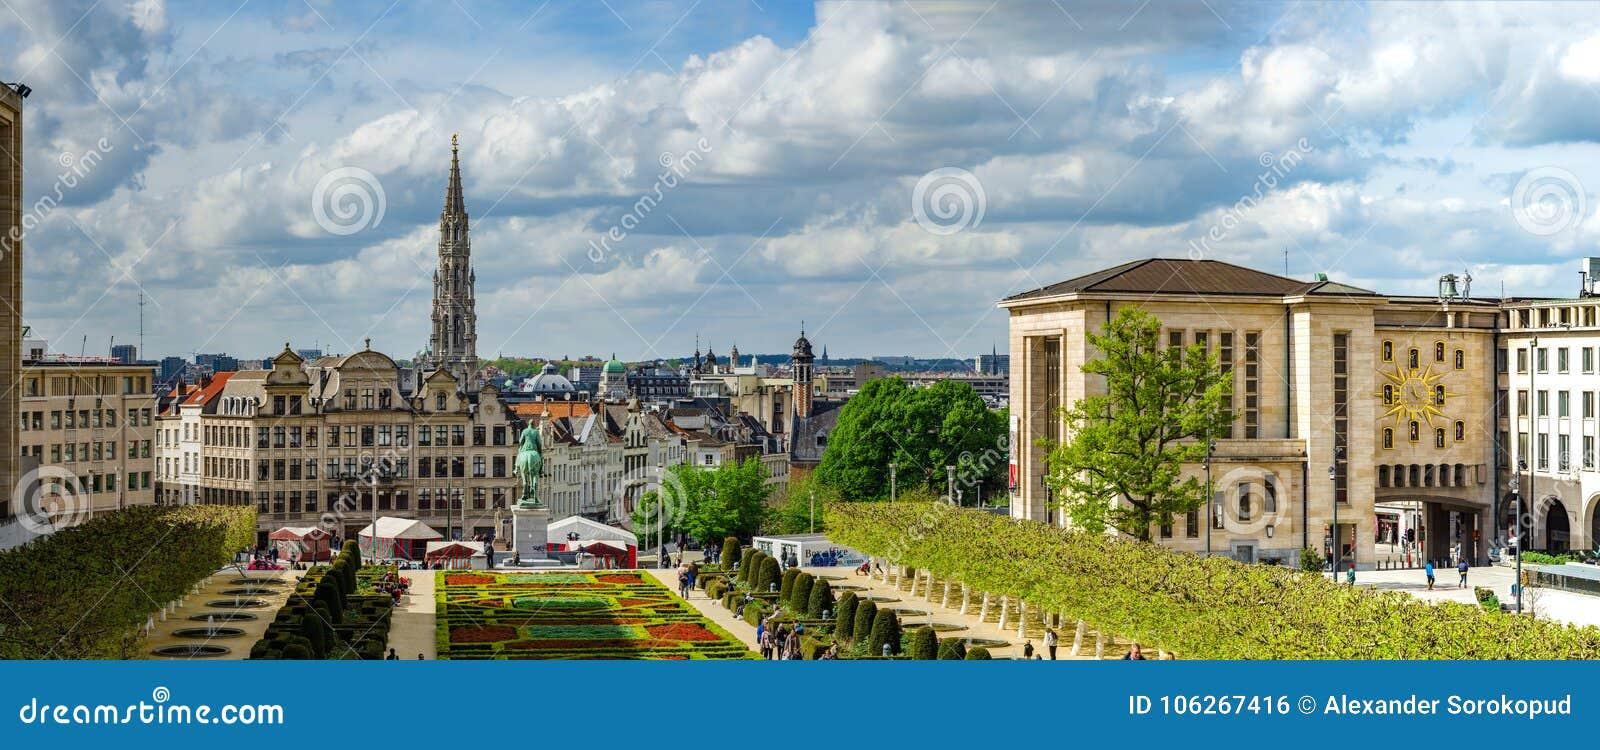 Hoofdartikel: 16 April 2017: Brussel, België Hoge resolutie p